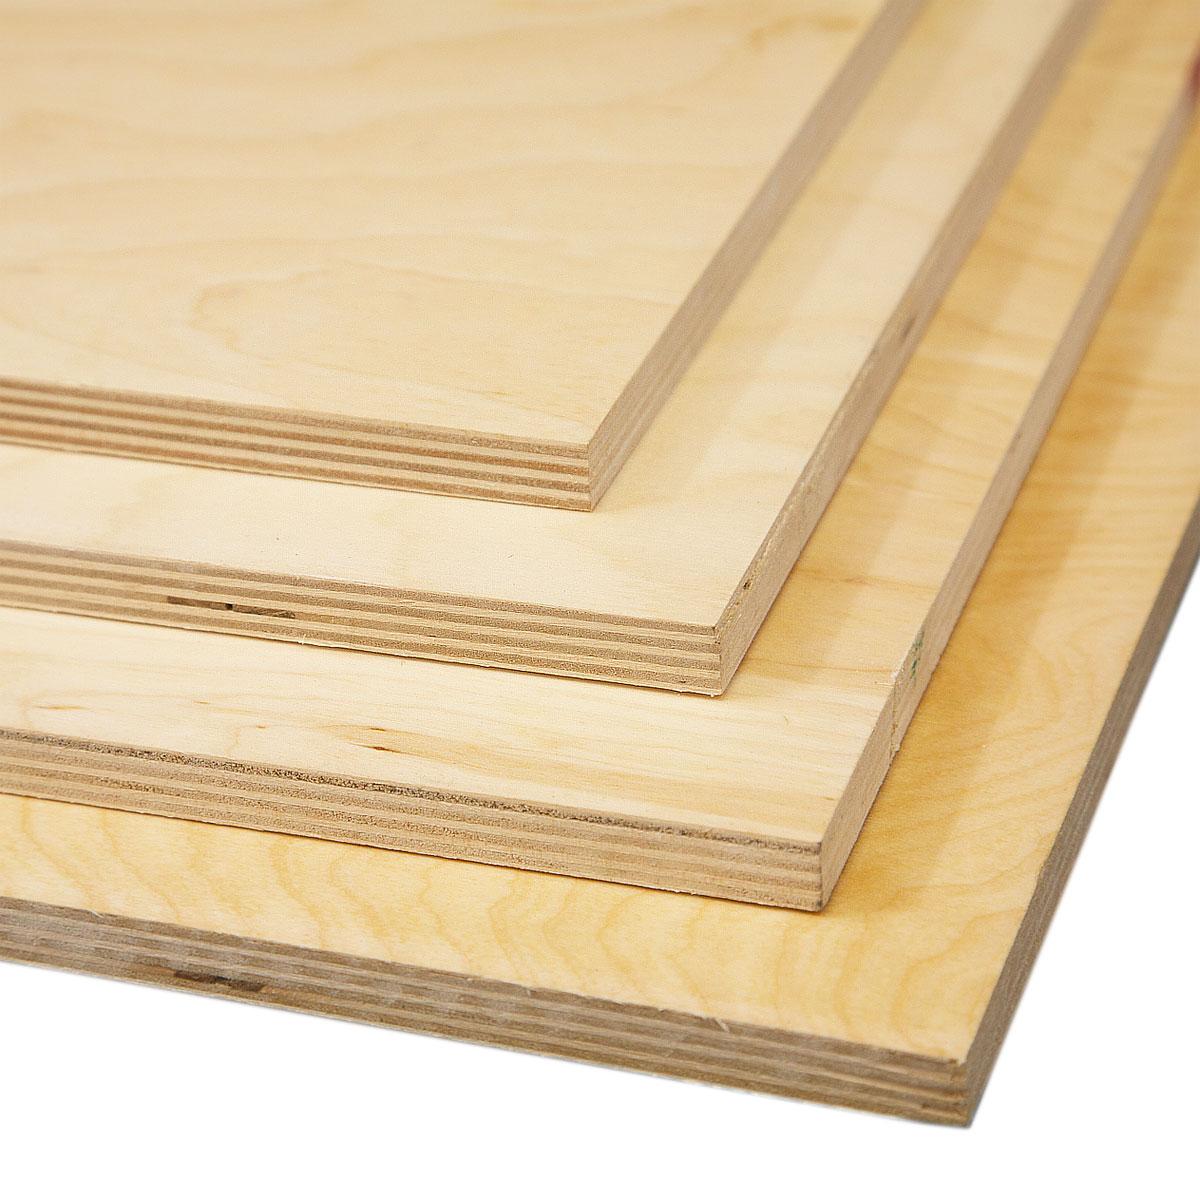 3 4 4x8 Maple Plywood 1pf 18mm